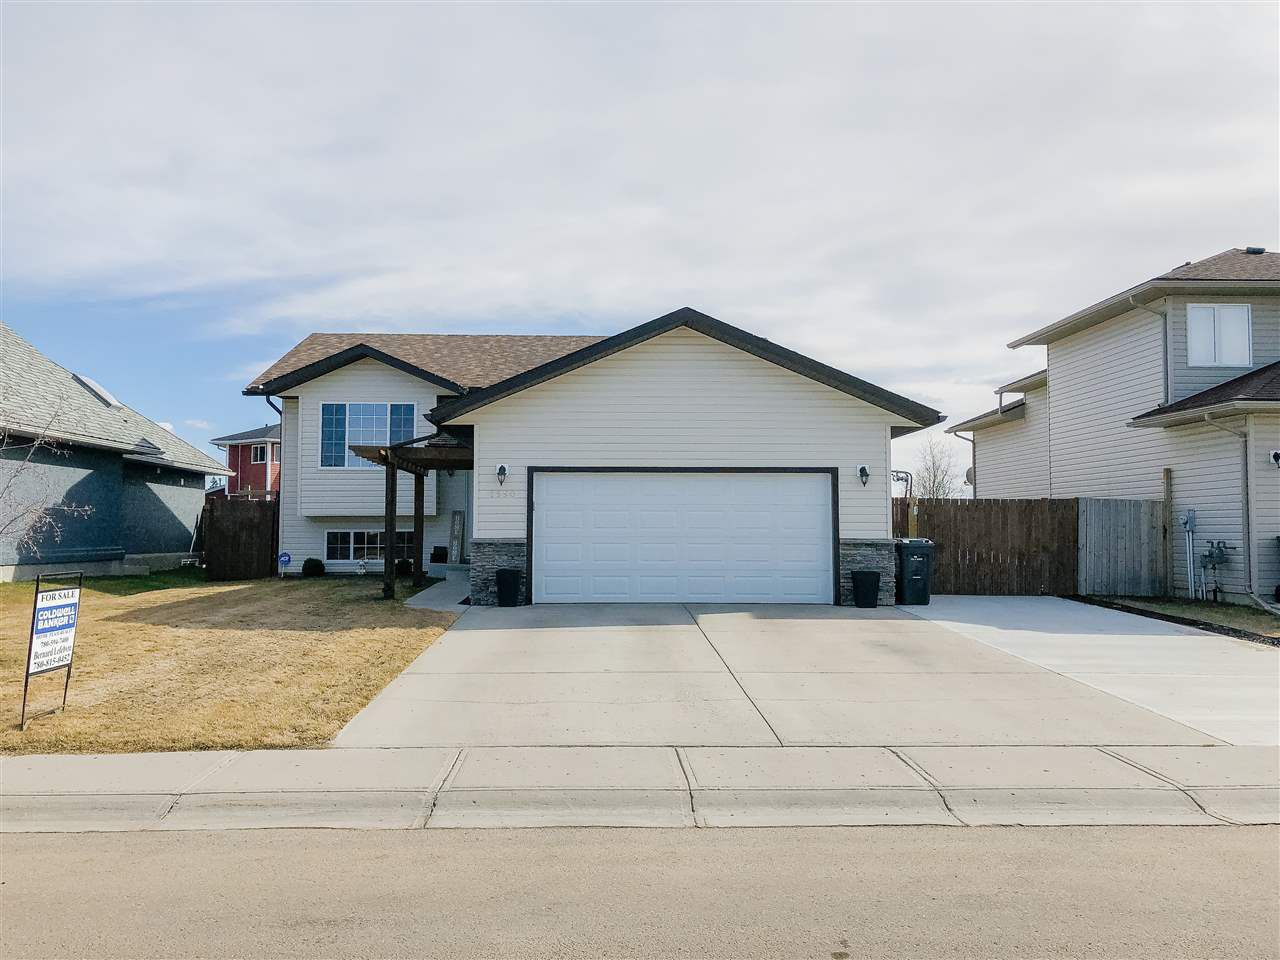 Main Photo: 2550 Lockhart Way: Cold Lake House for sale : MLS®# E4154658